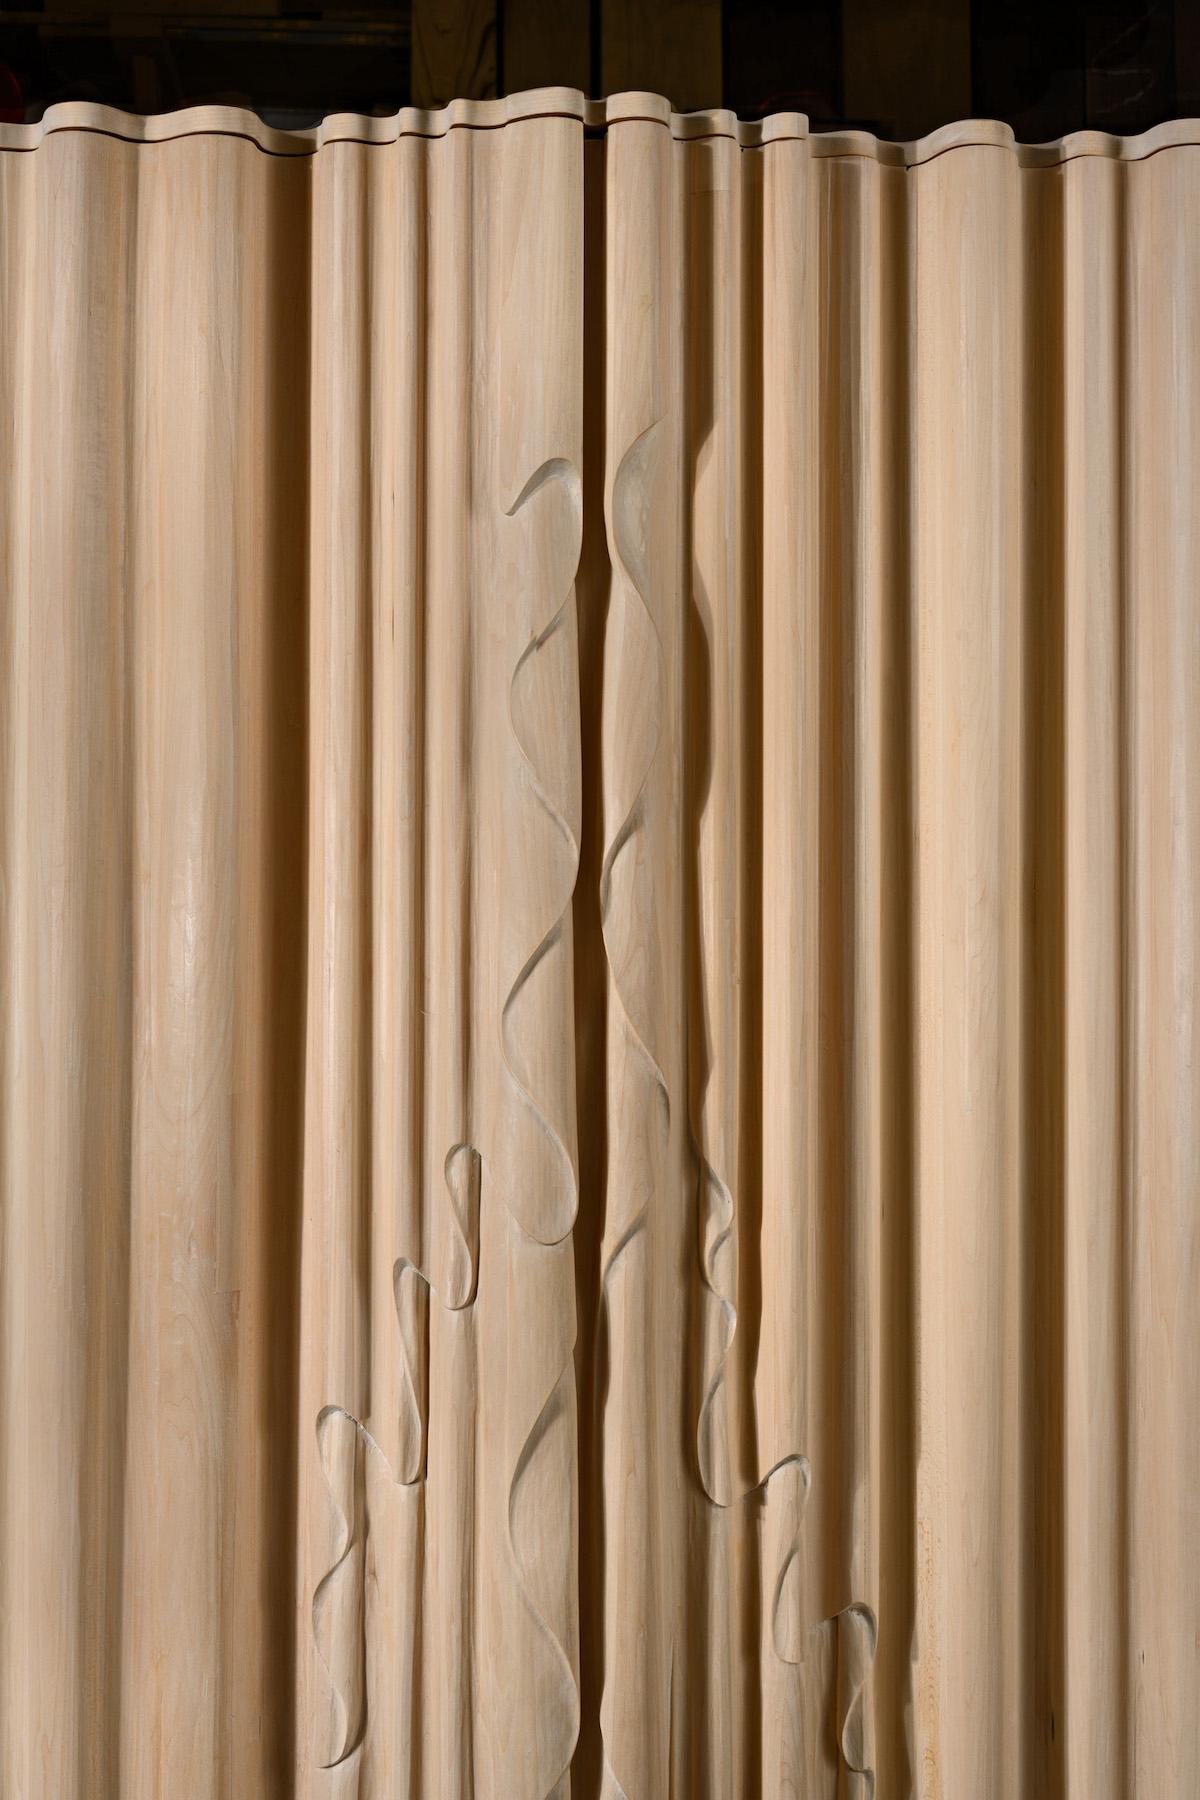 surface detail Linenfold Armoire (Perpendicular Style) by artist Christopher Kurtz